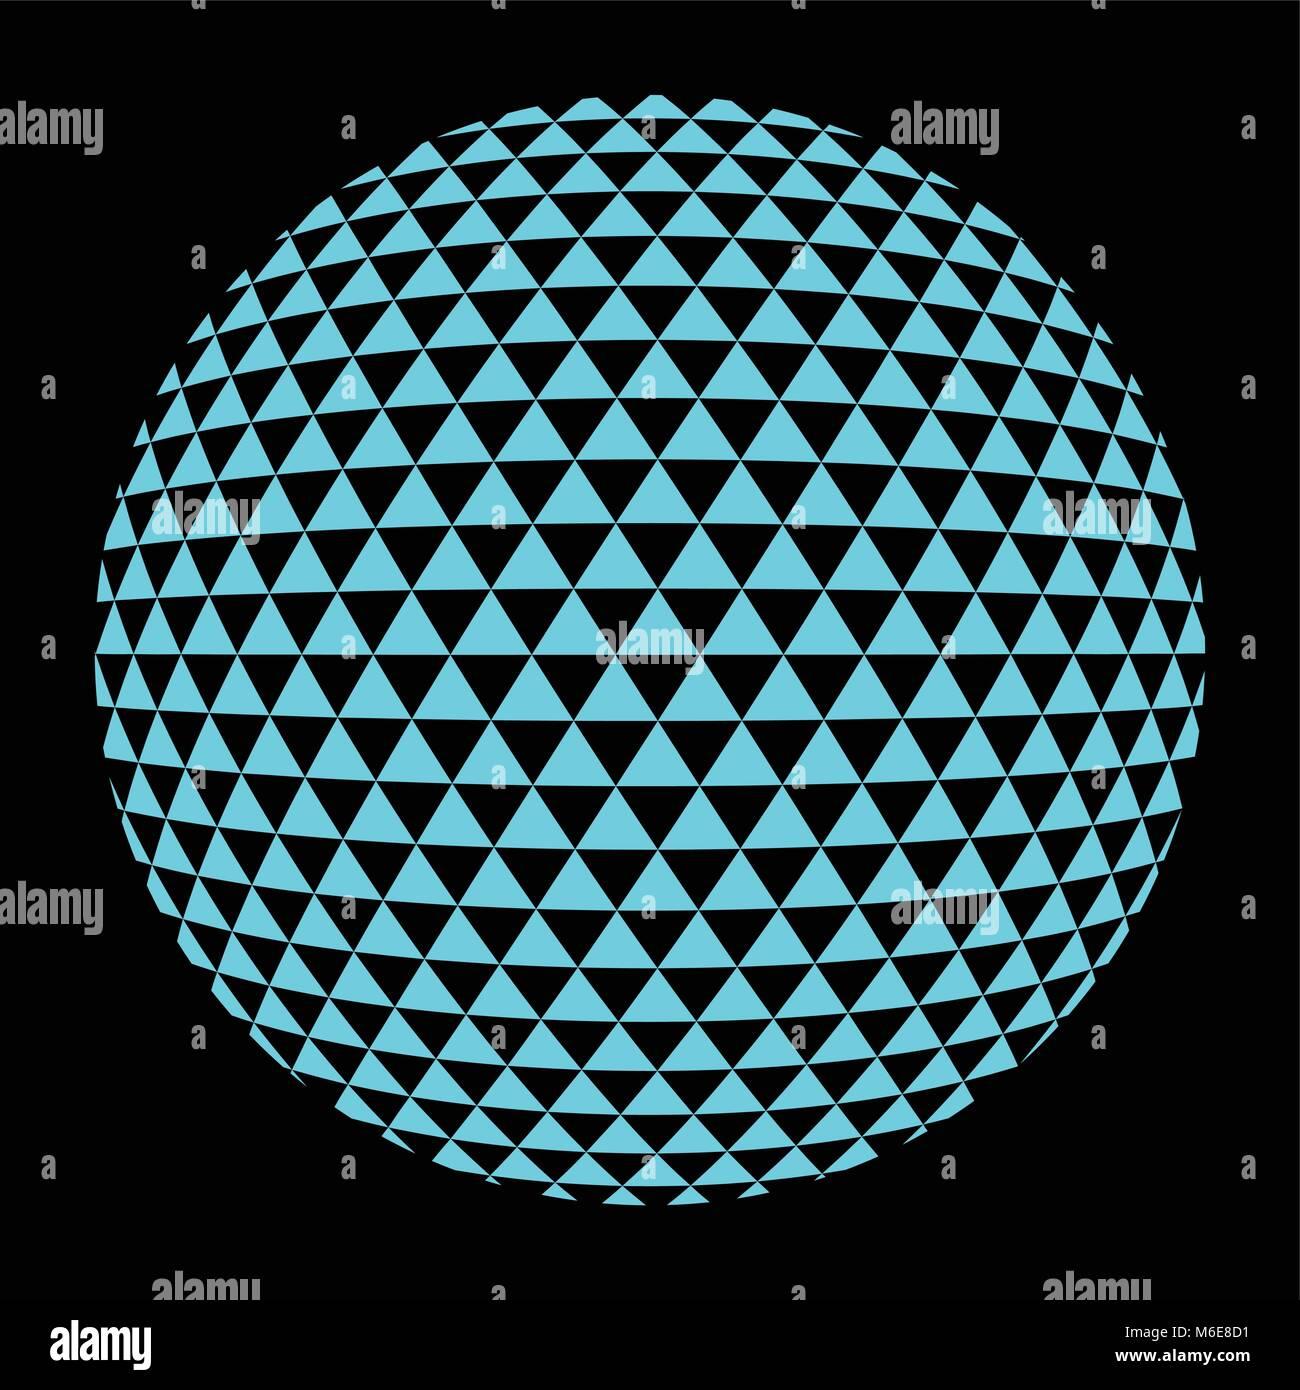 halftone blue circle - Stock Image